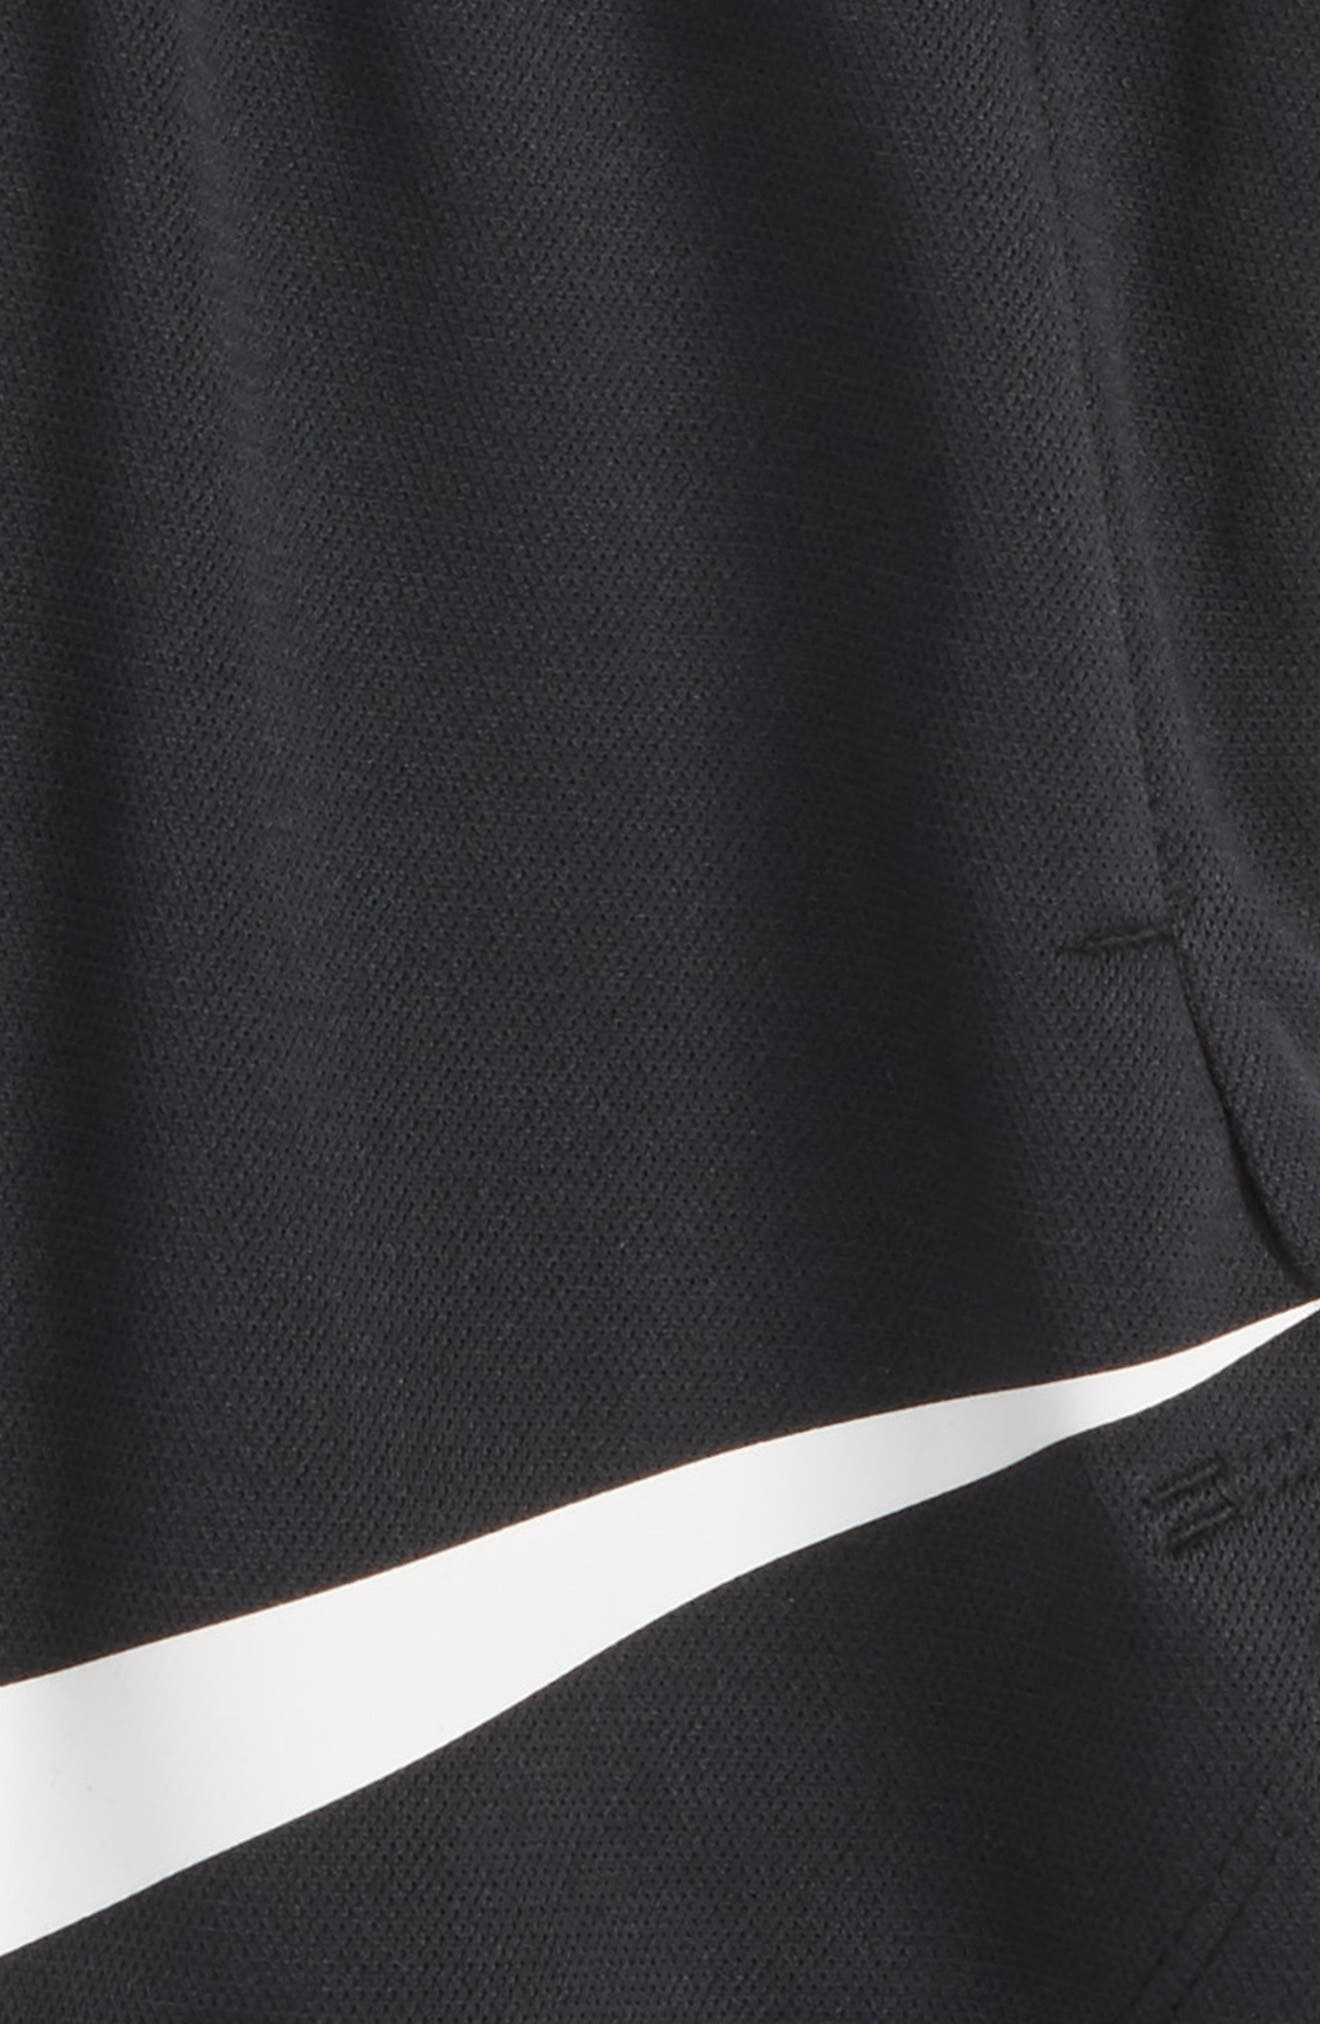 Vent GFX Dri-FIT Shorts, Main, color, 001